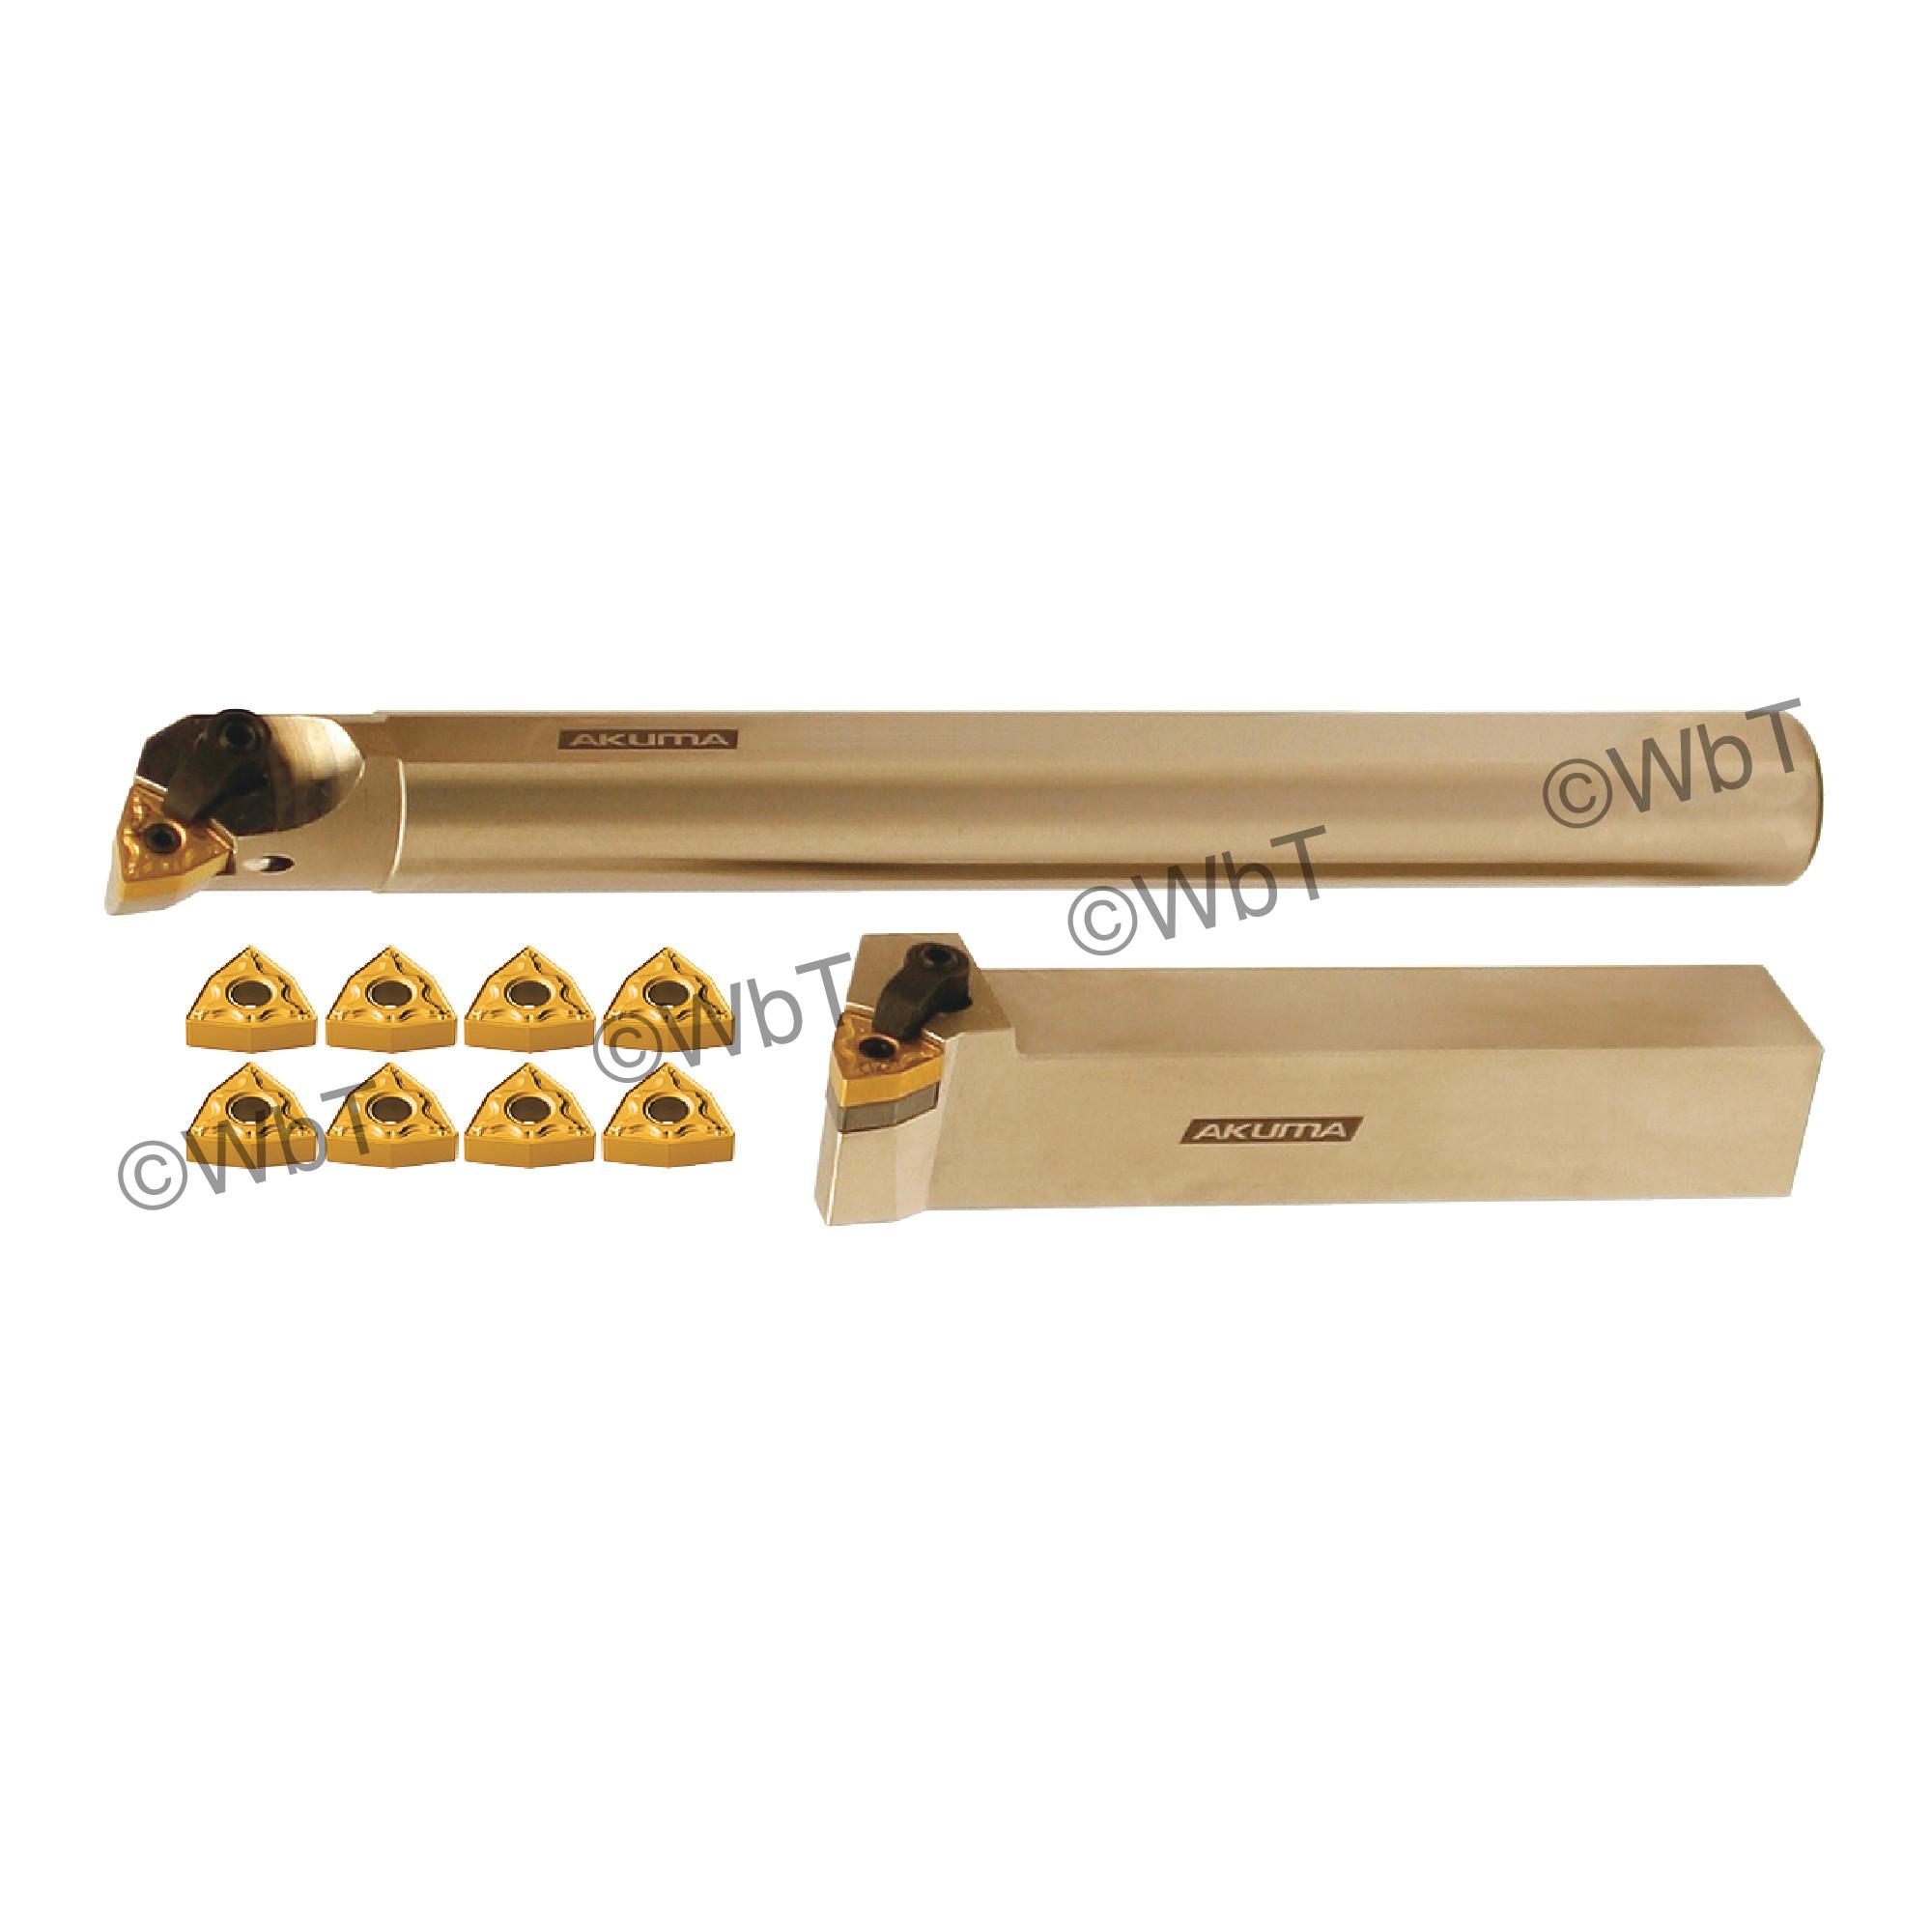 "AKUMA - 1.000"" WNMG43_ Turning & Boring Bar Set / Includes: (1) MWLNR16-4D (1.0"" Tool Holder), (1) A16S-MWLNR-4 (1.0""&os"